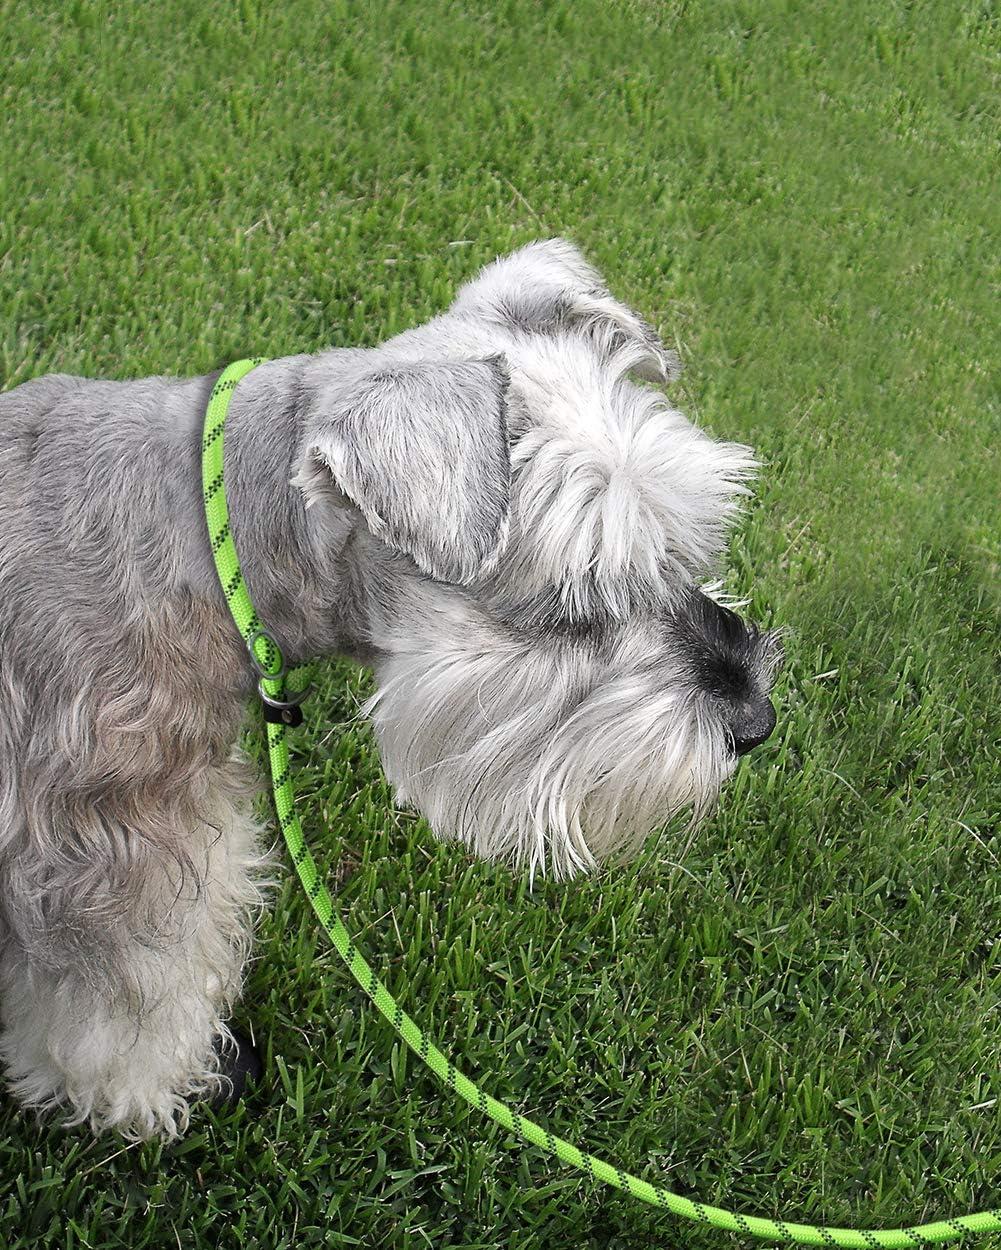 Joytale Slip Lead Dog Leash Reflective Rope Training Leash with Comfortable Padded Handle for Small Medium Dogs,6 Feet